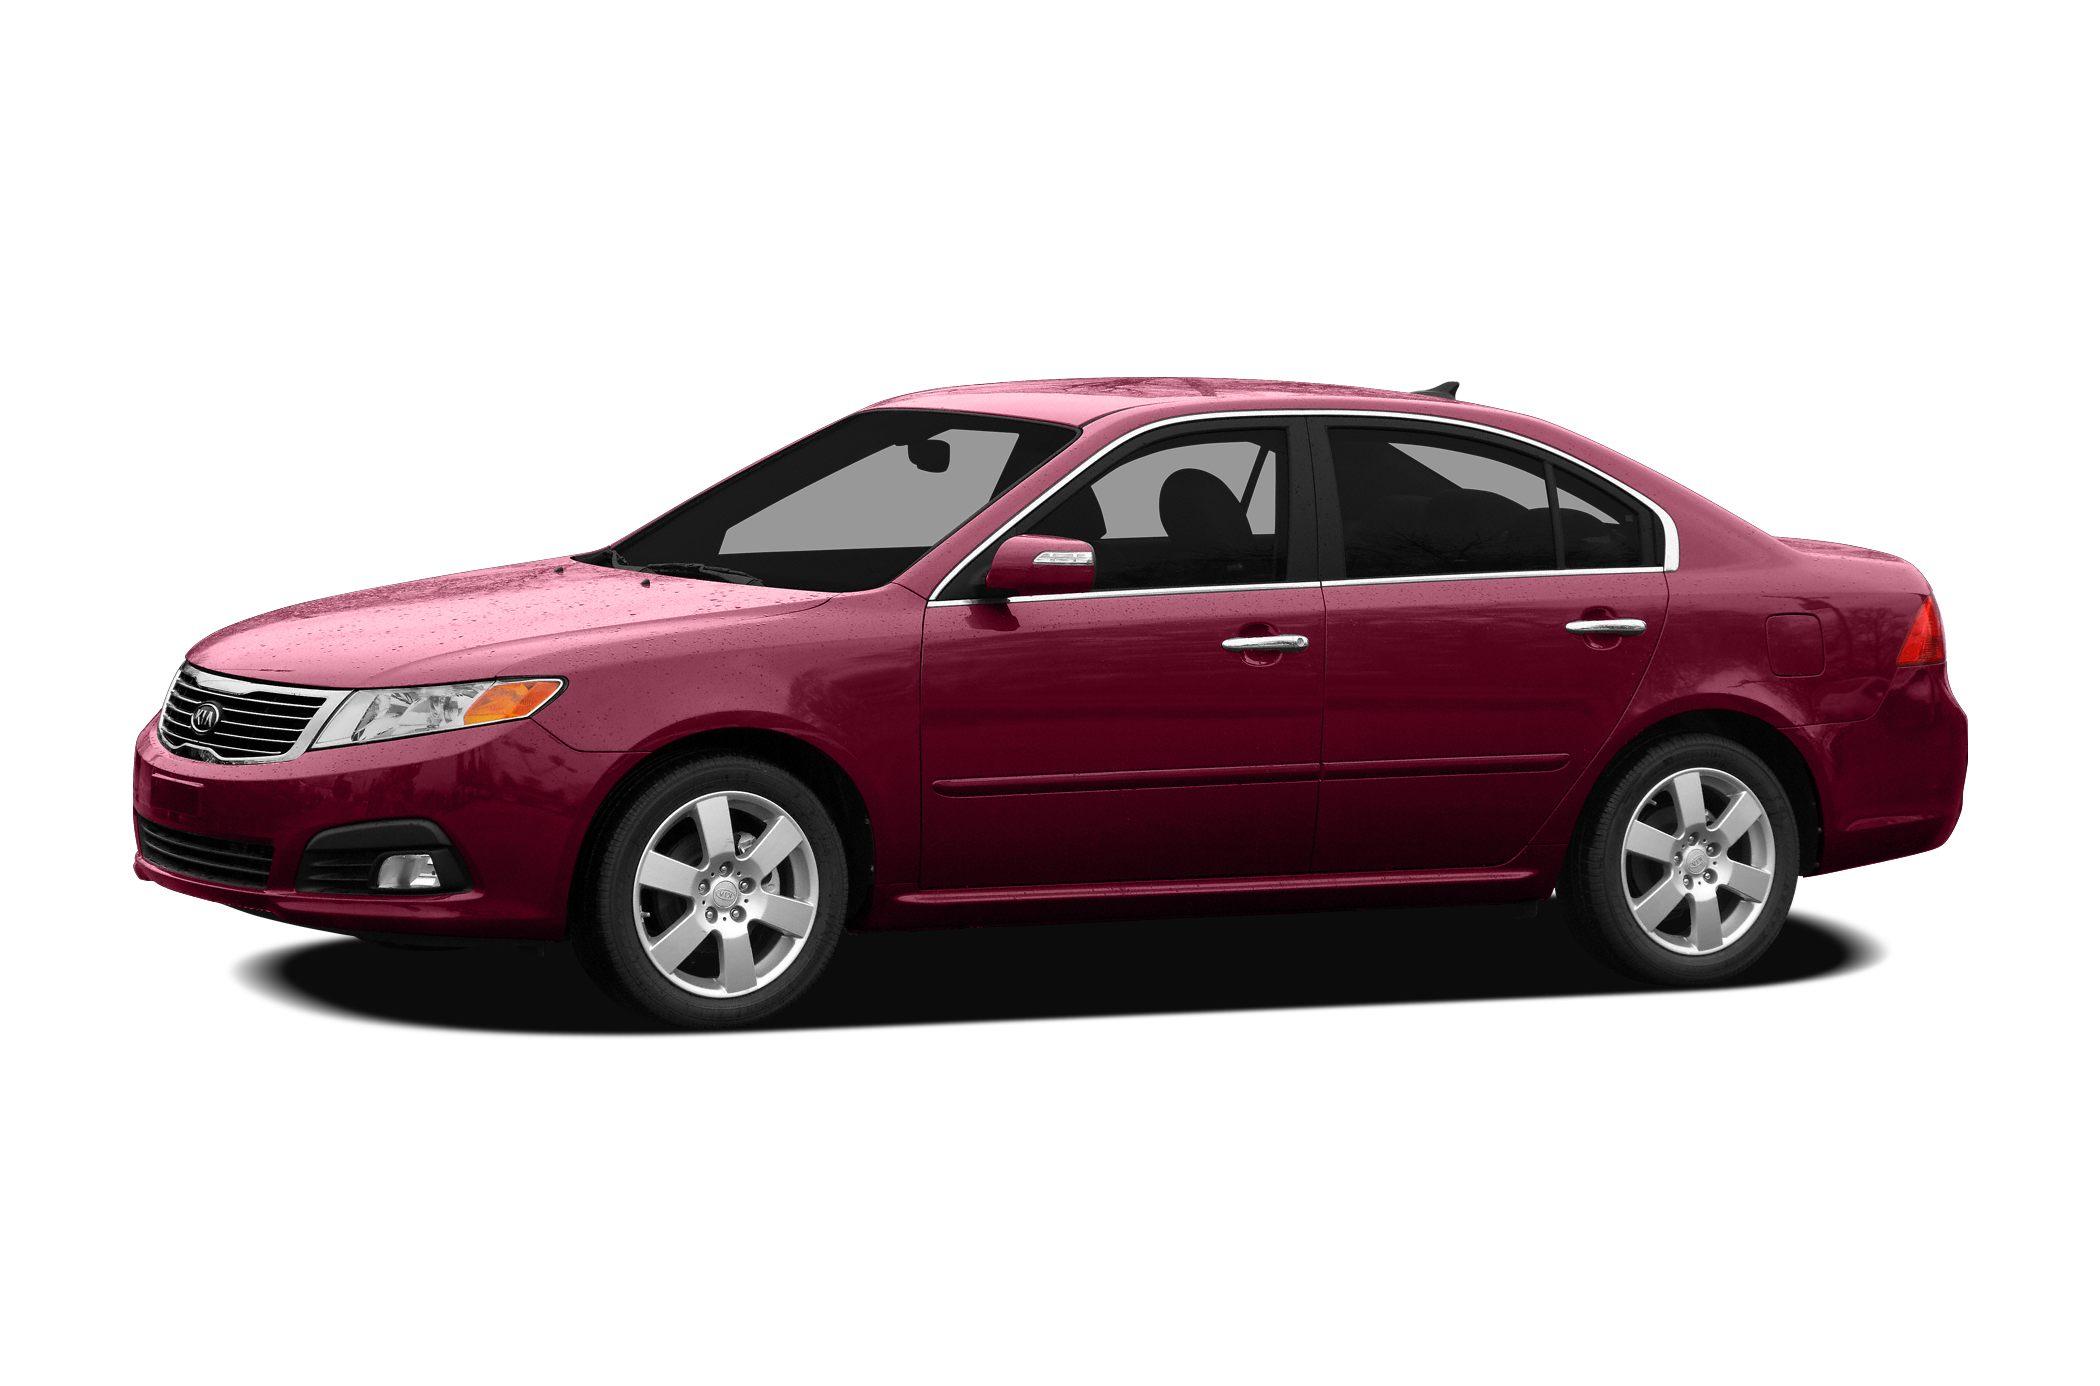 2009 Kia Optima LX Sedan for sale in Winston Salem for $9,298 with 64,725 miles.